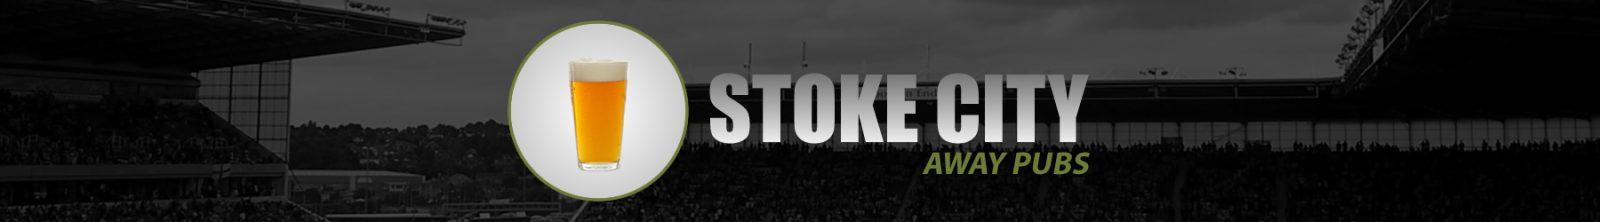 Stoke City Away Pubs